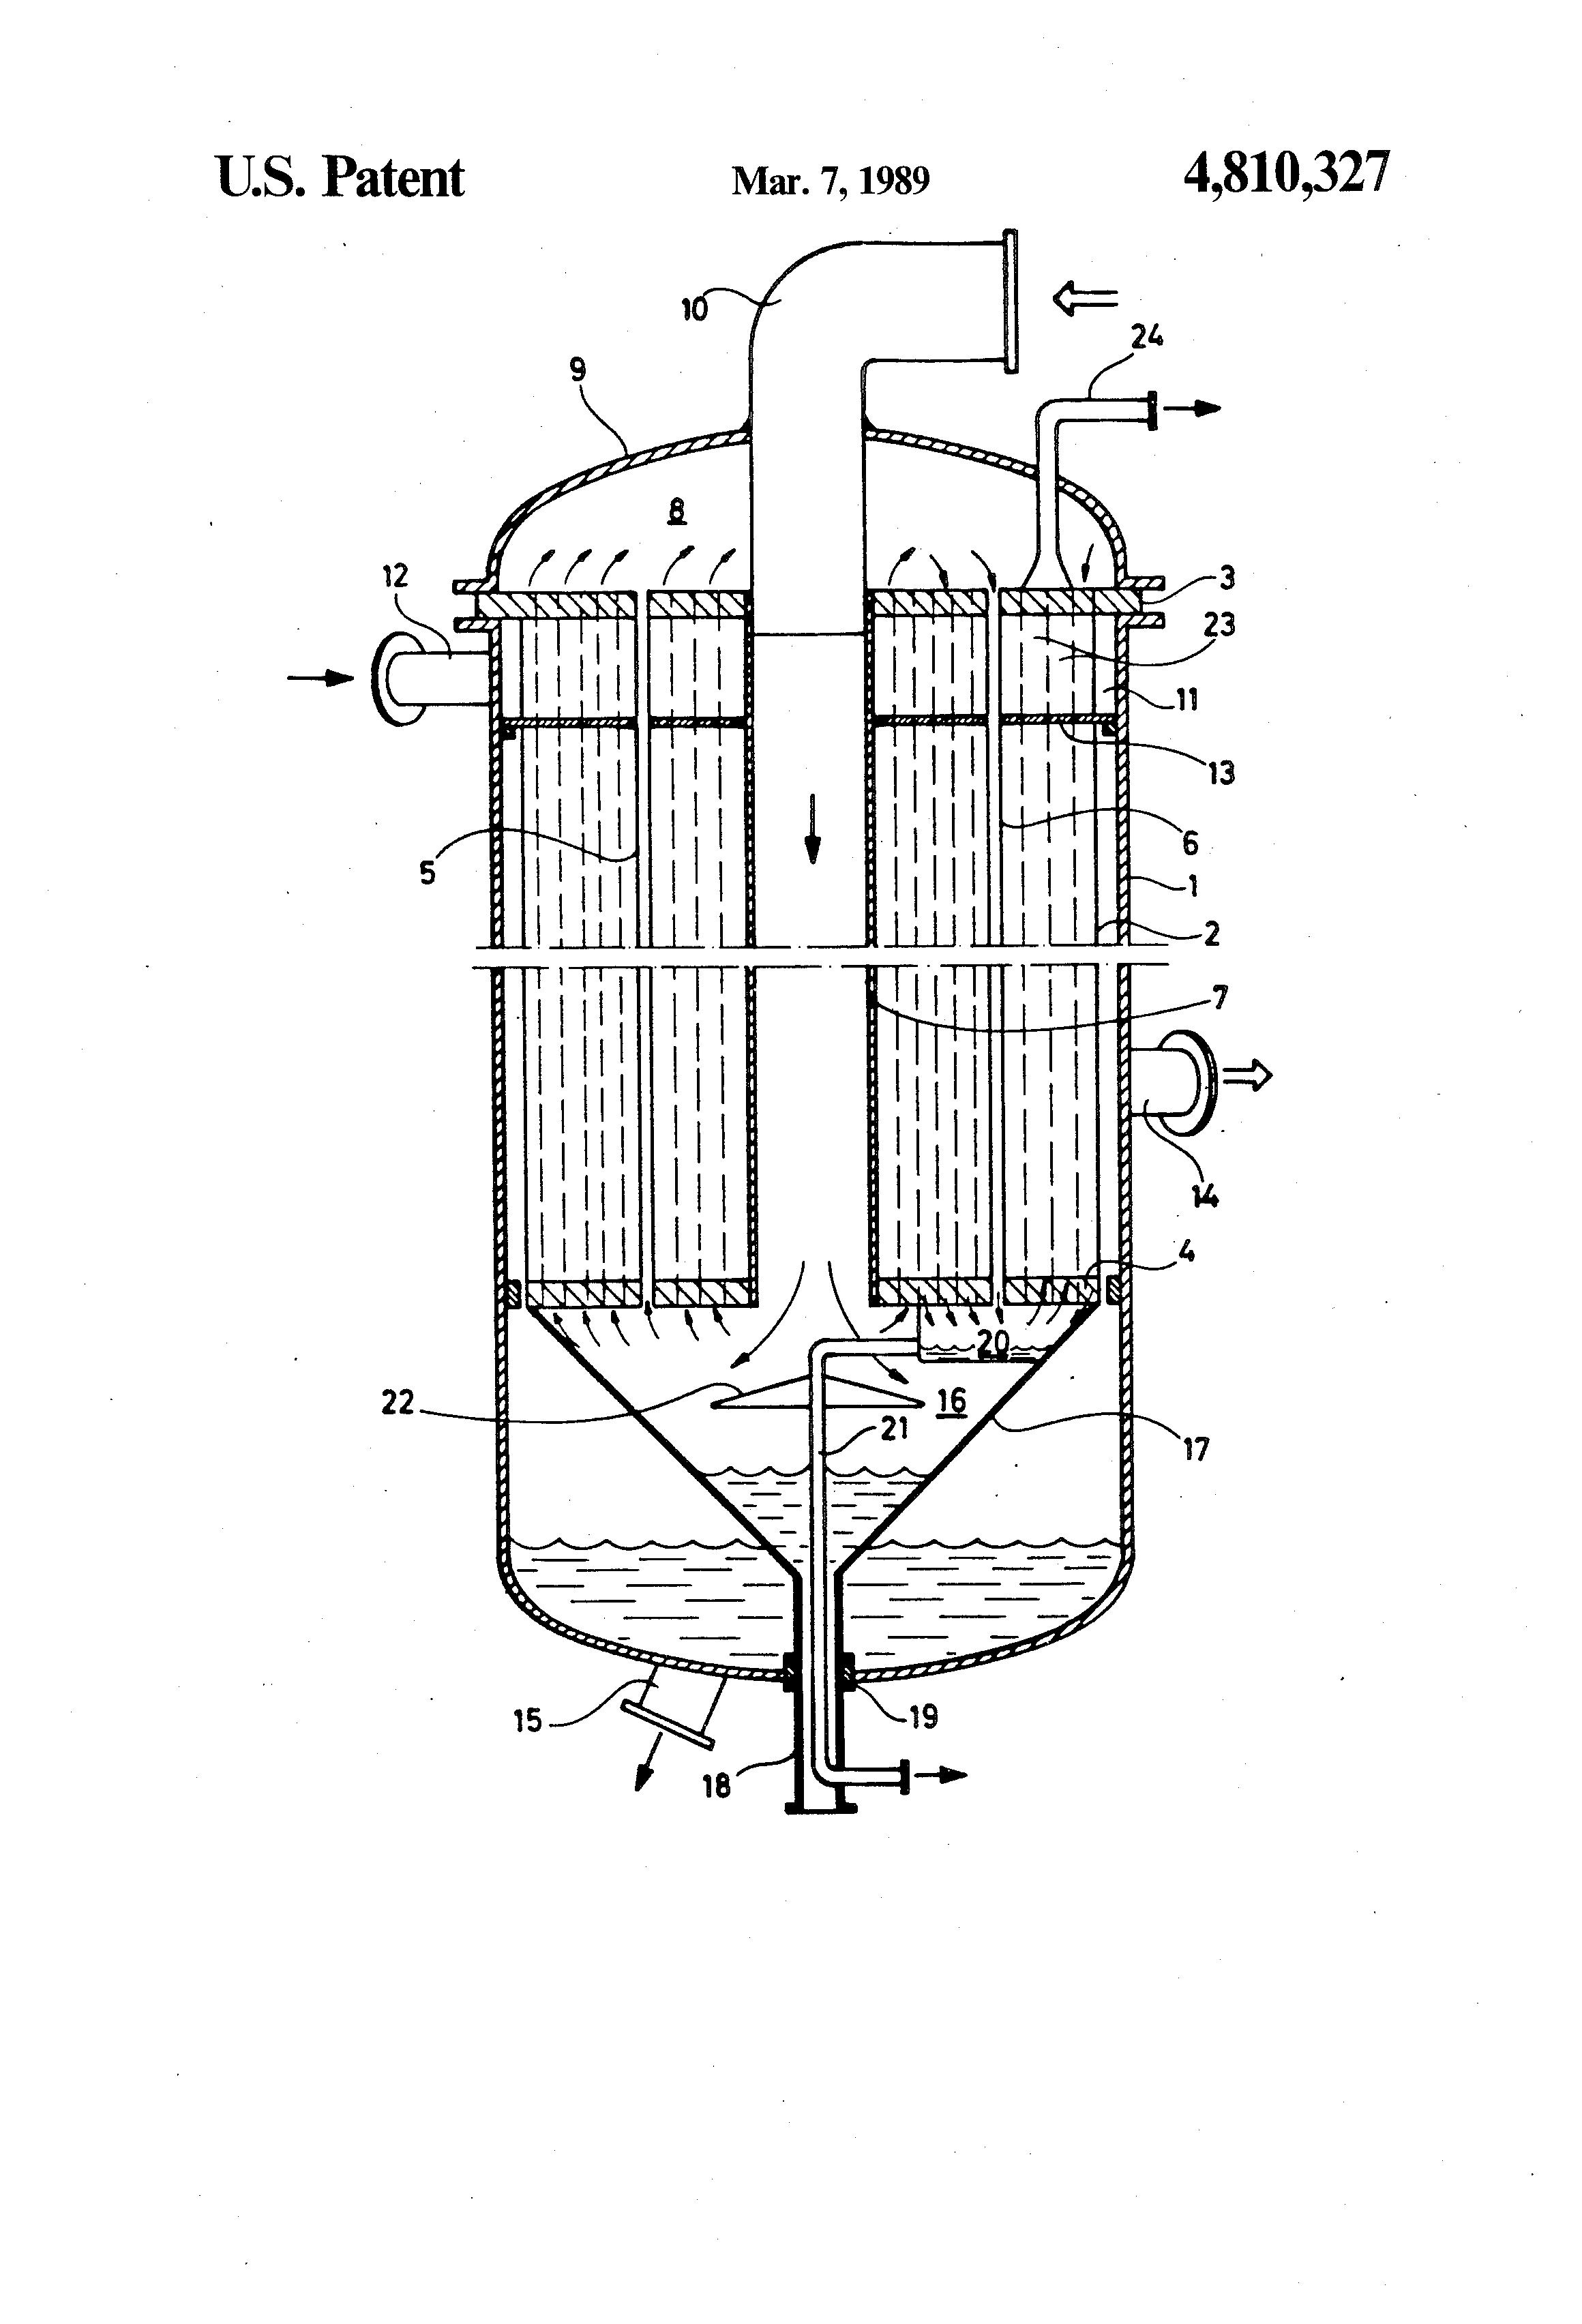 diagram of a heat exchanger